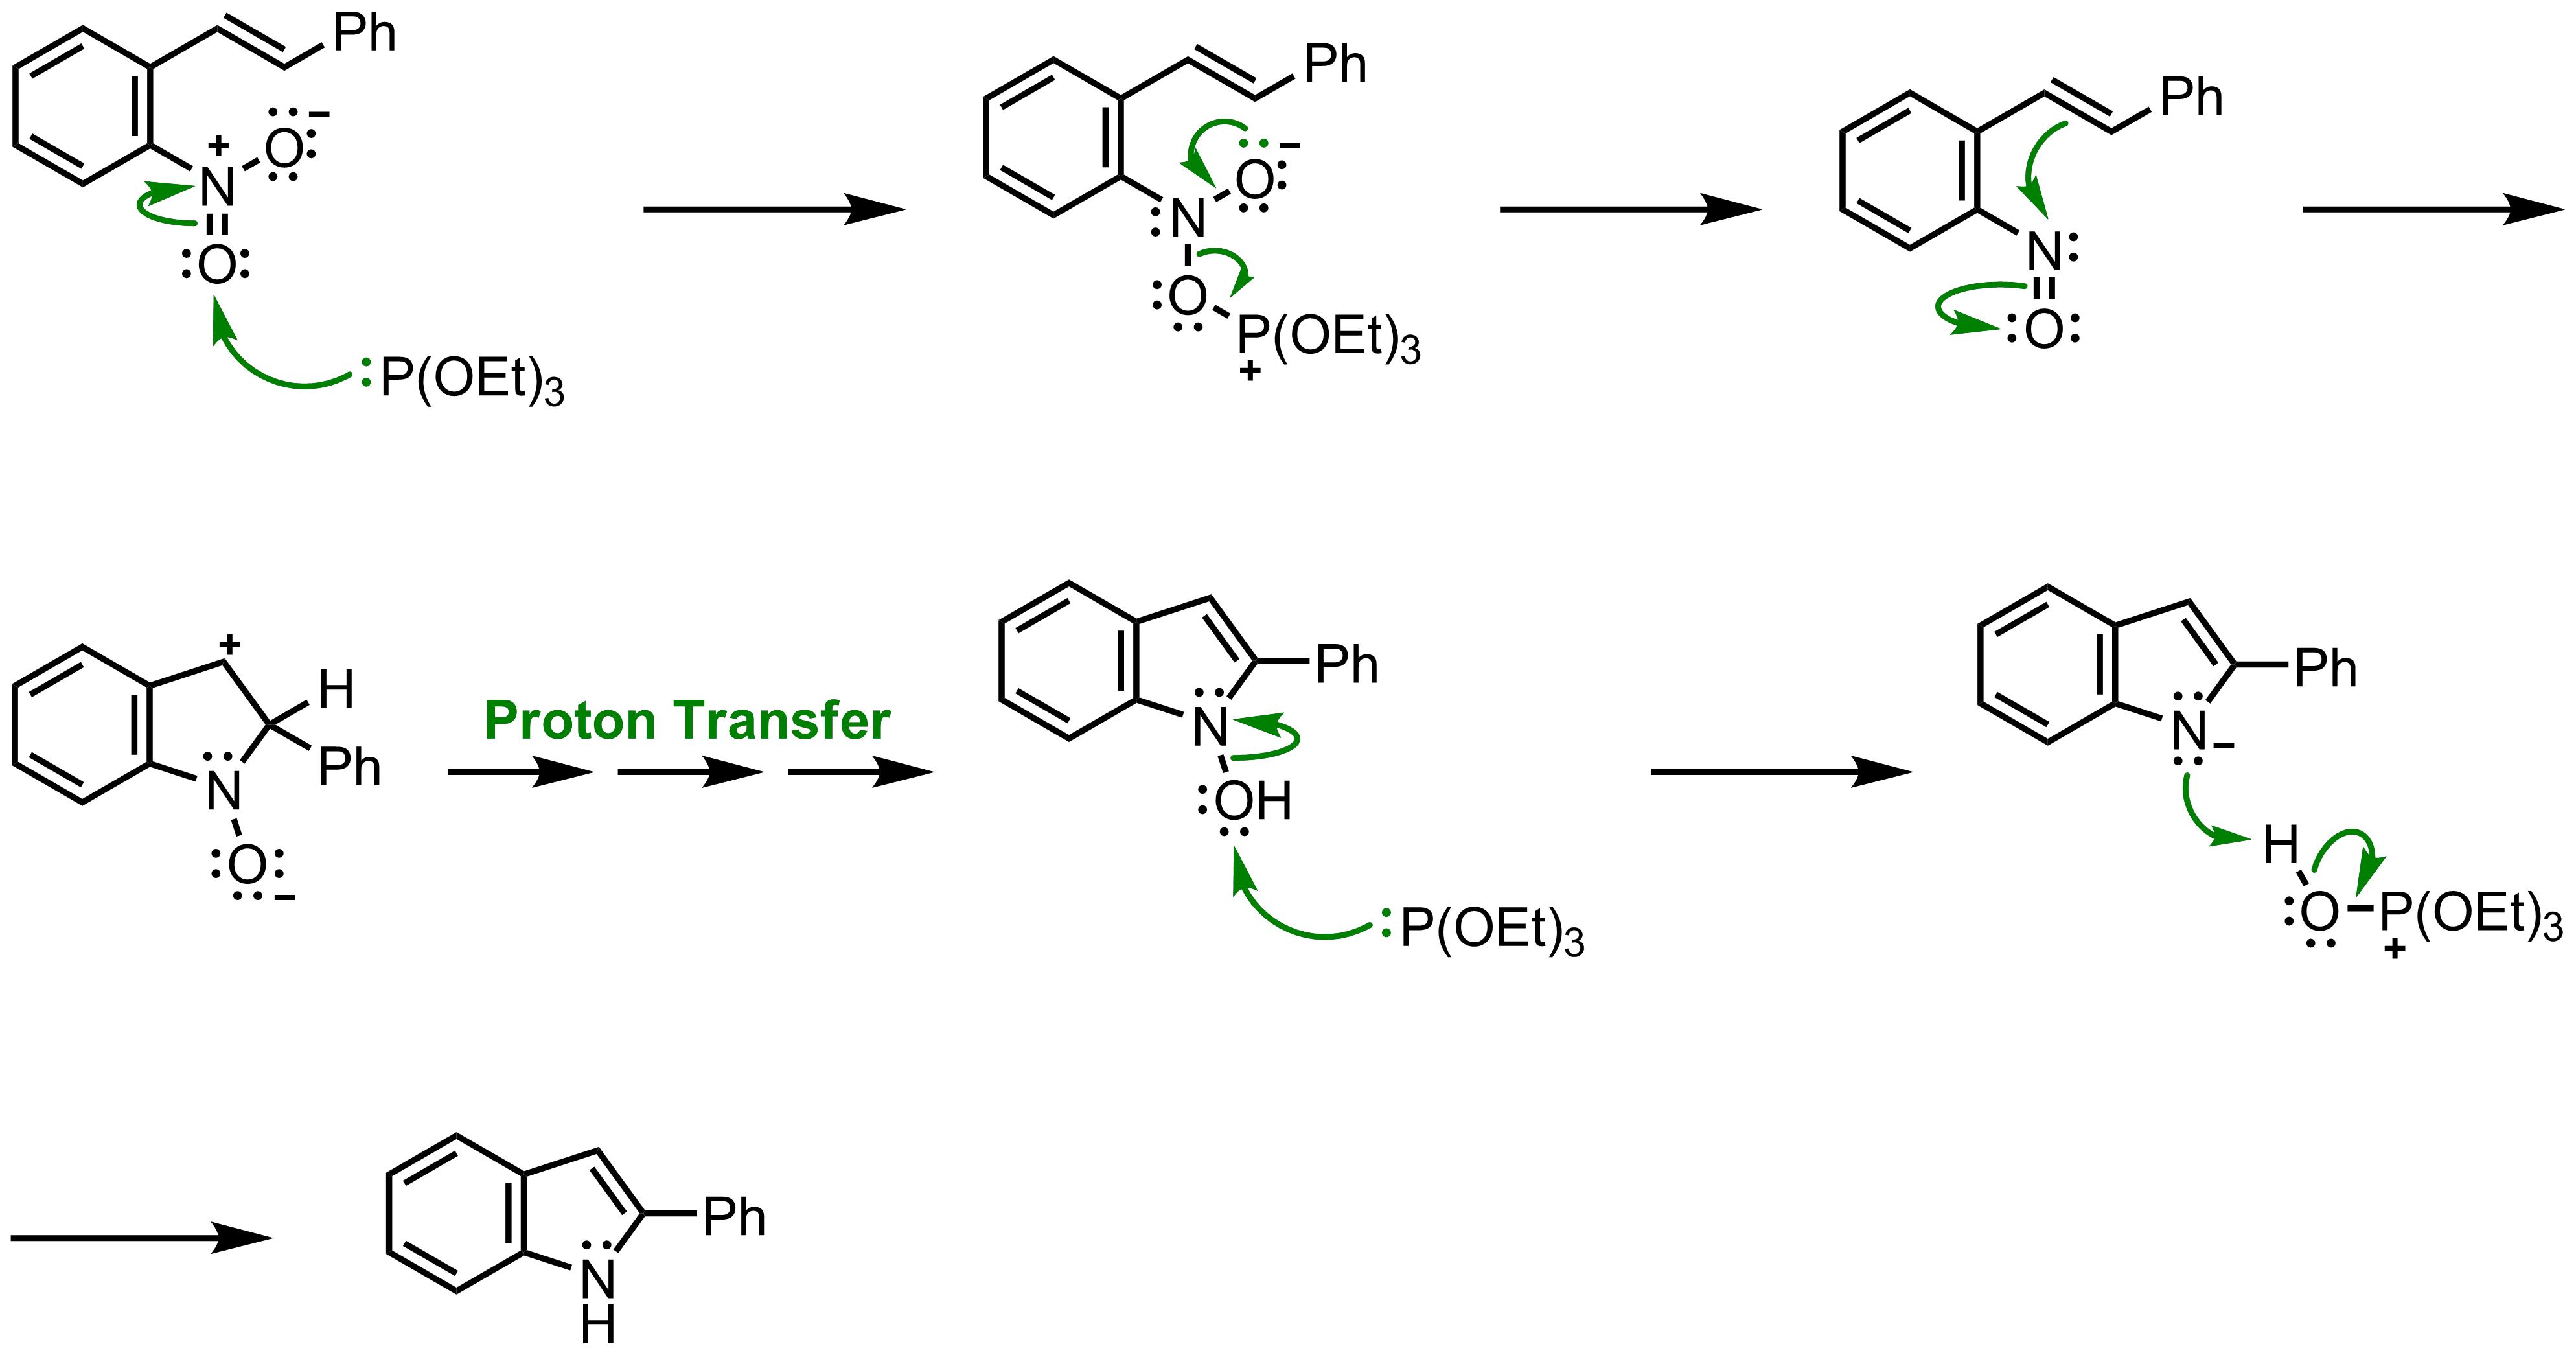 Mechanism of the Cadogan-Sundberg Indole Synthesis